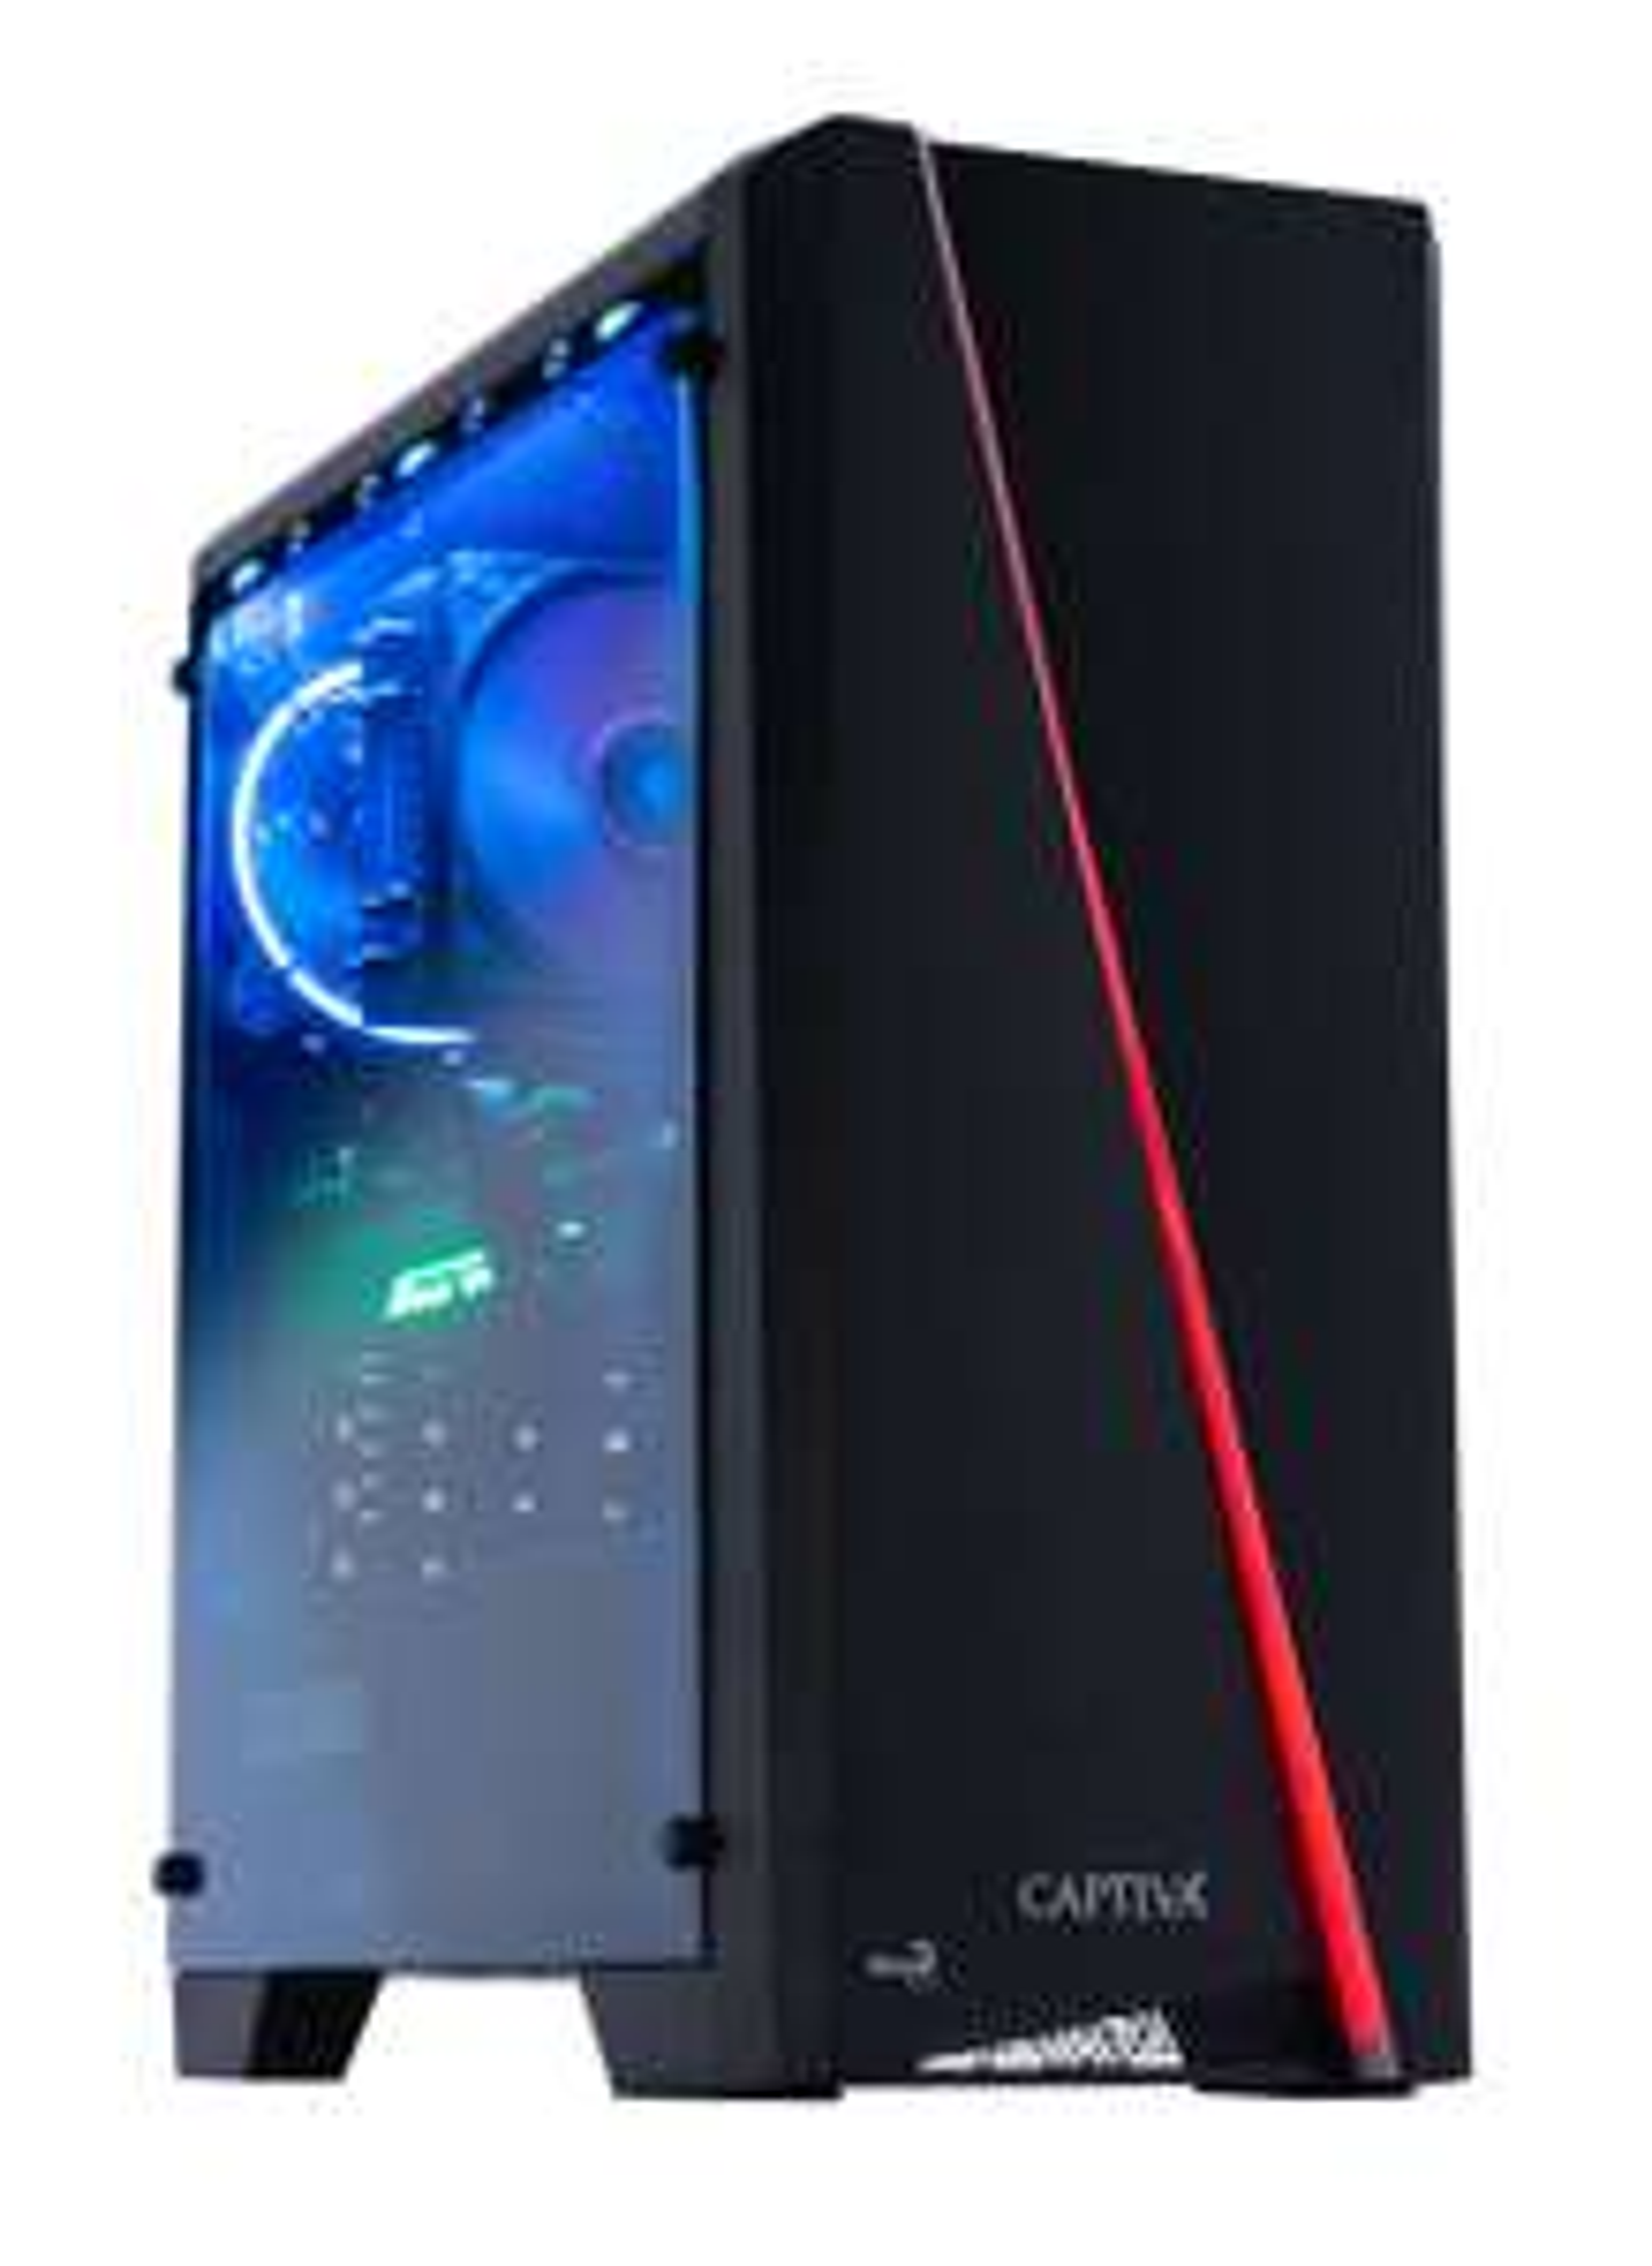 Low budget Gaming PC Ryzen 2600X (3600X), RTX 2060 6GB, 16GB DDR4-2400 (2666), B450, 480GB SSD + 1TB HDD, ohne Win